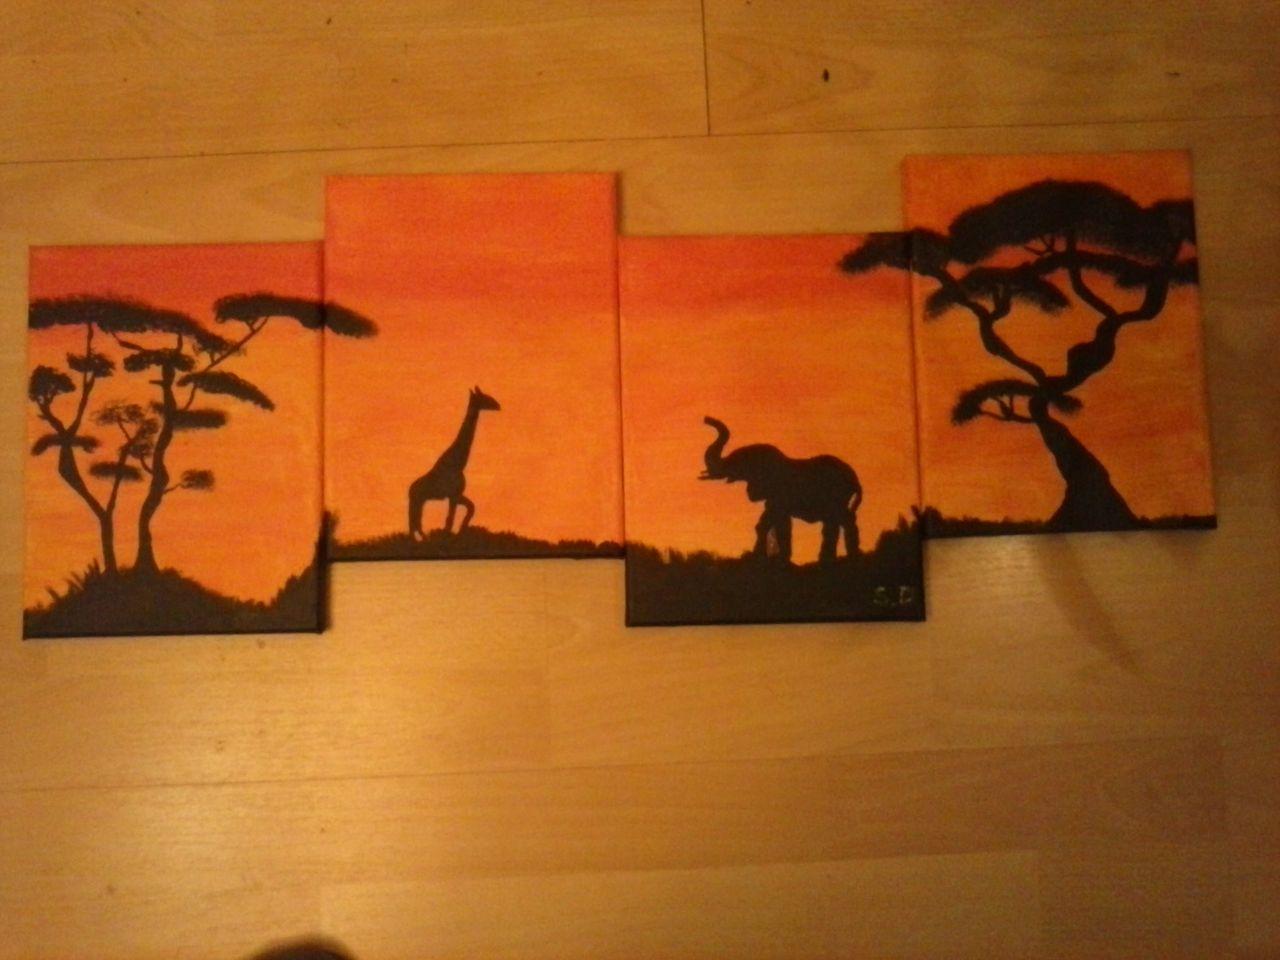 bild afrika malerei landschaften von stefan digel bei kunstnet. Black Bedroom Furniture Sets. Home Design Ideas